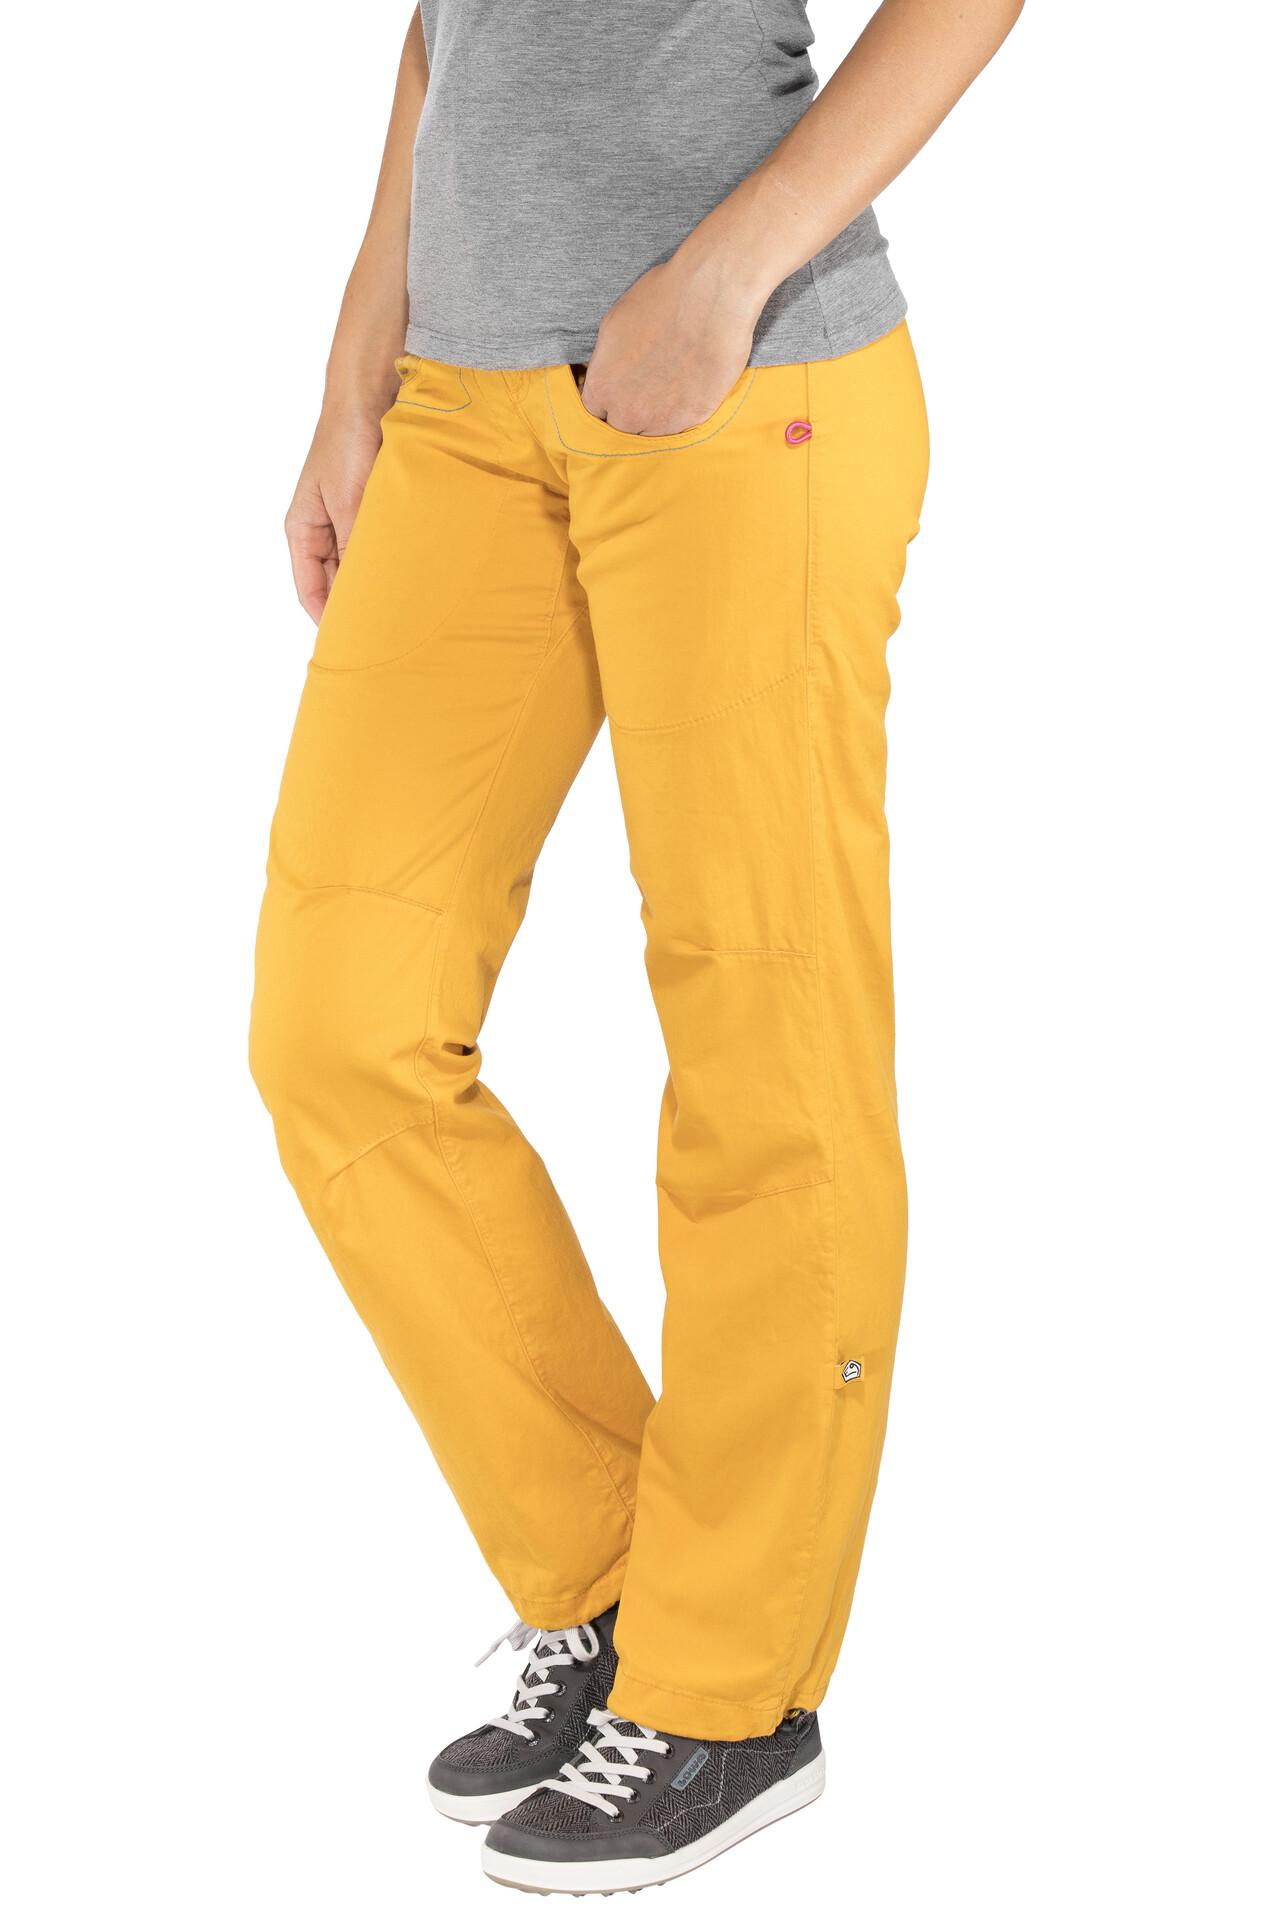 1f73ddc53 E9 de amarillo Story Mujer Classic Pantalones Onda Trekking q4BqwRS